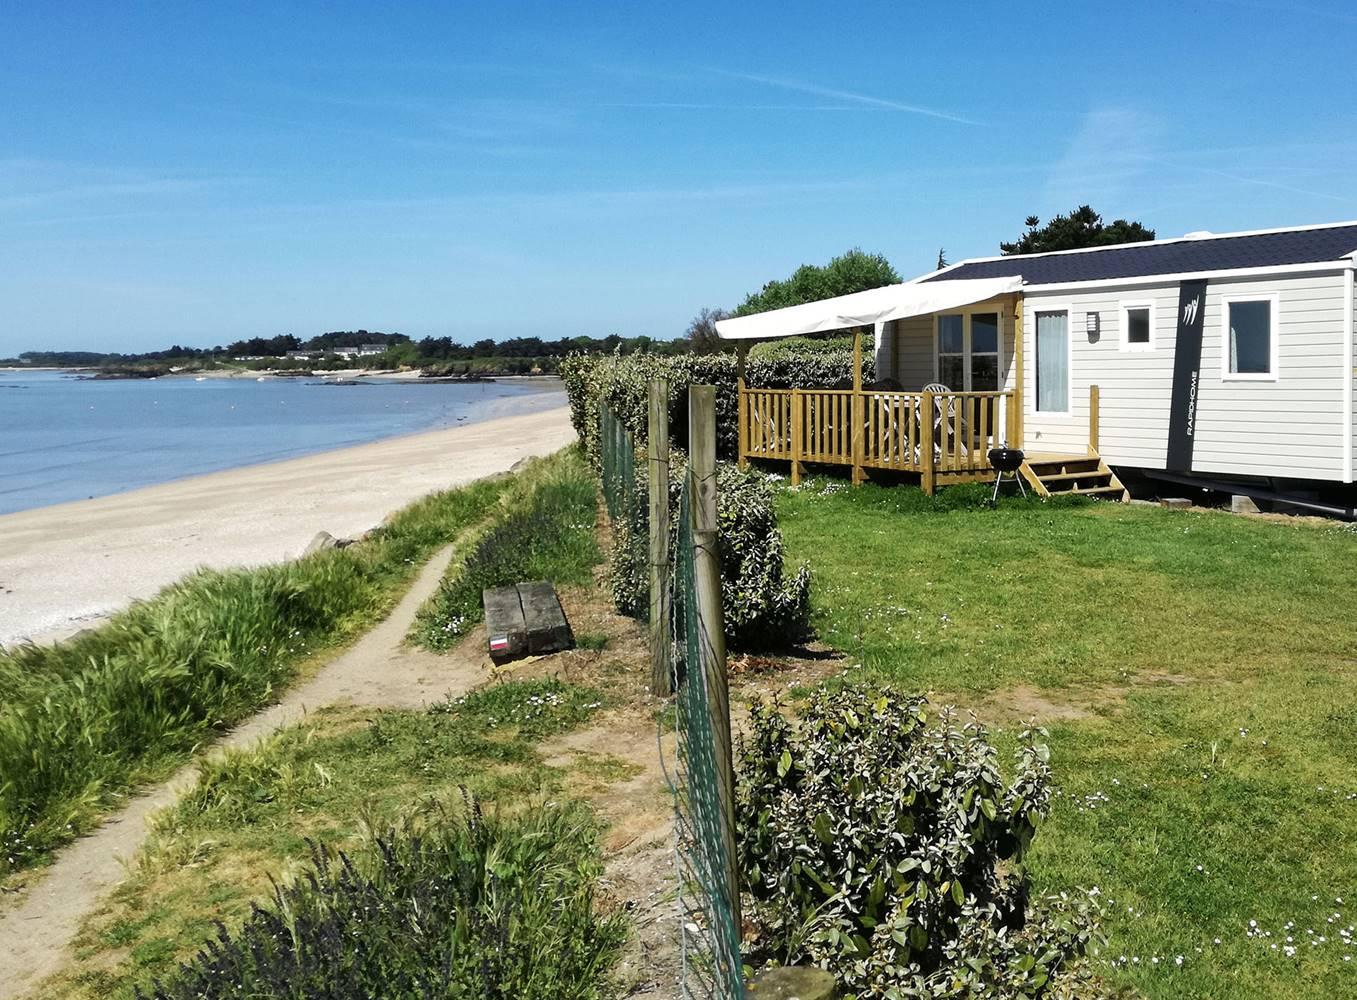 Camping Les Goélands - Mobil home 3 chambres face à la mer - ©